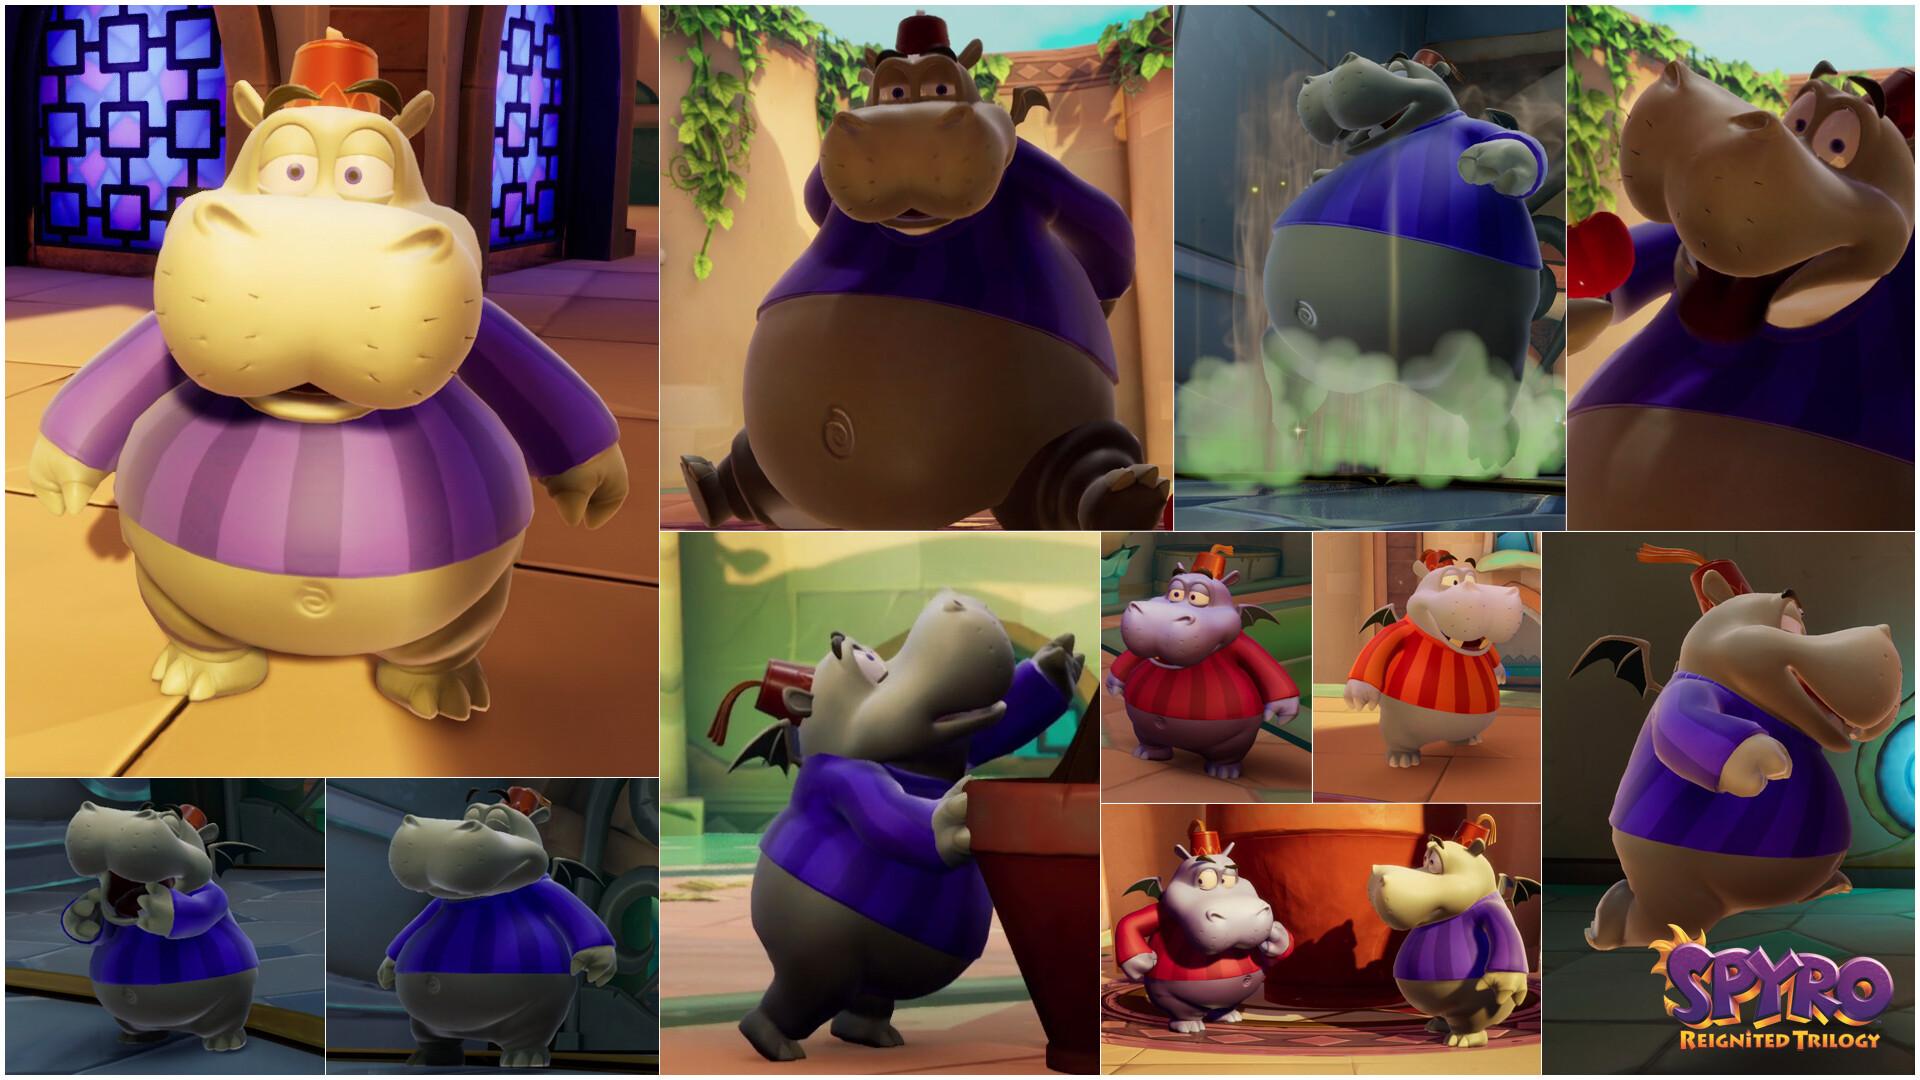 Alexandra jackson spyrotrilogy hippos collage